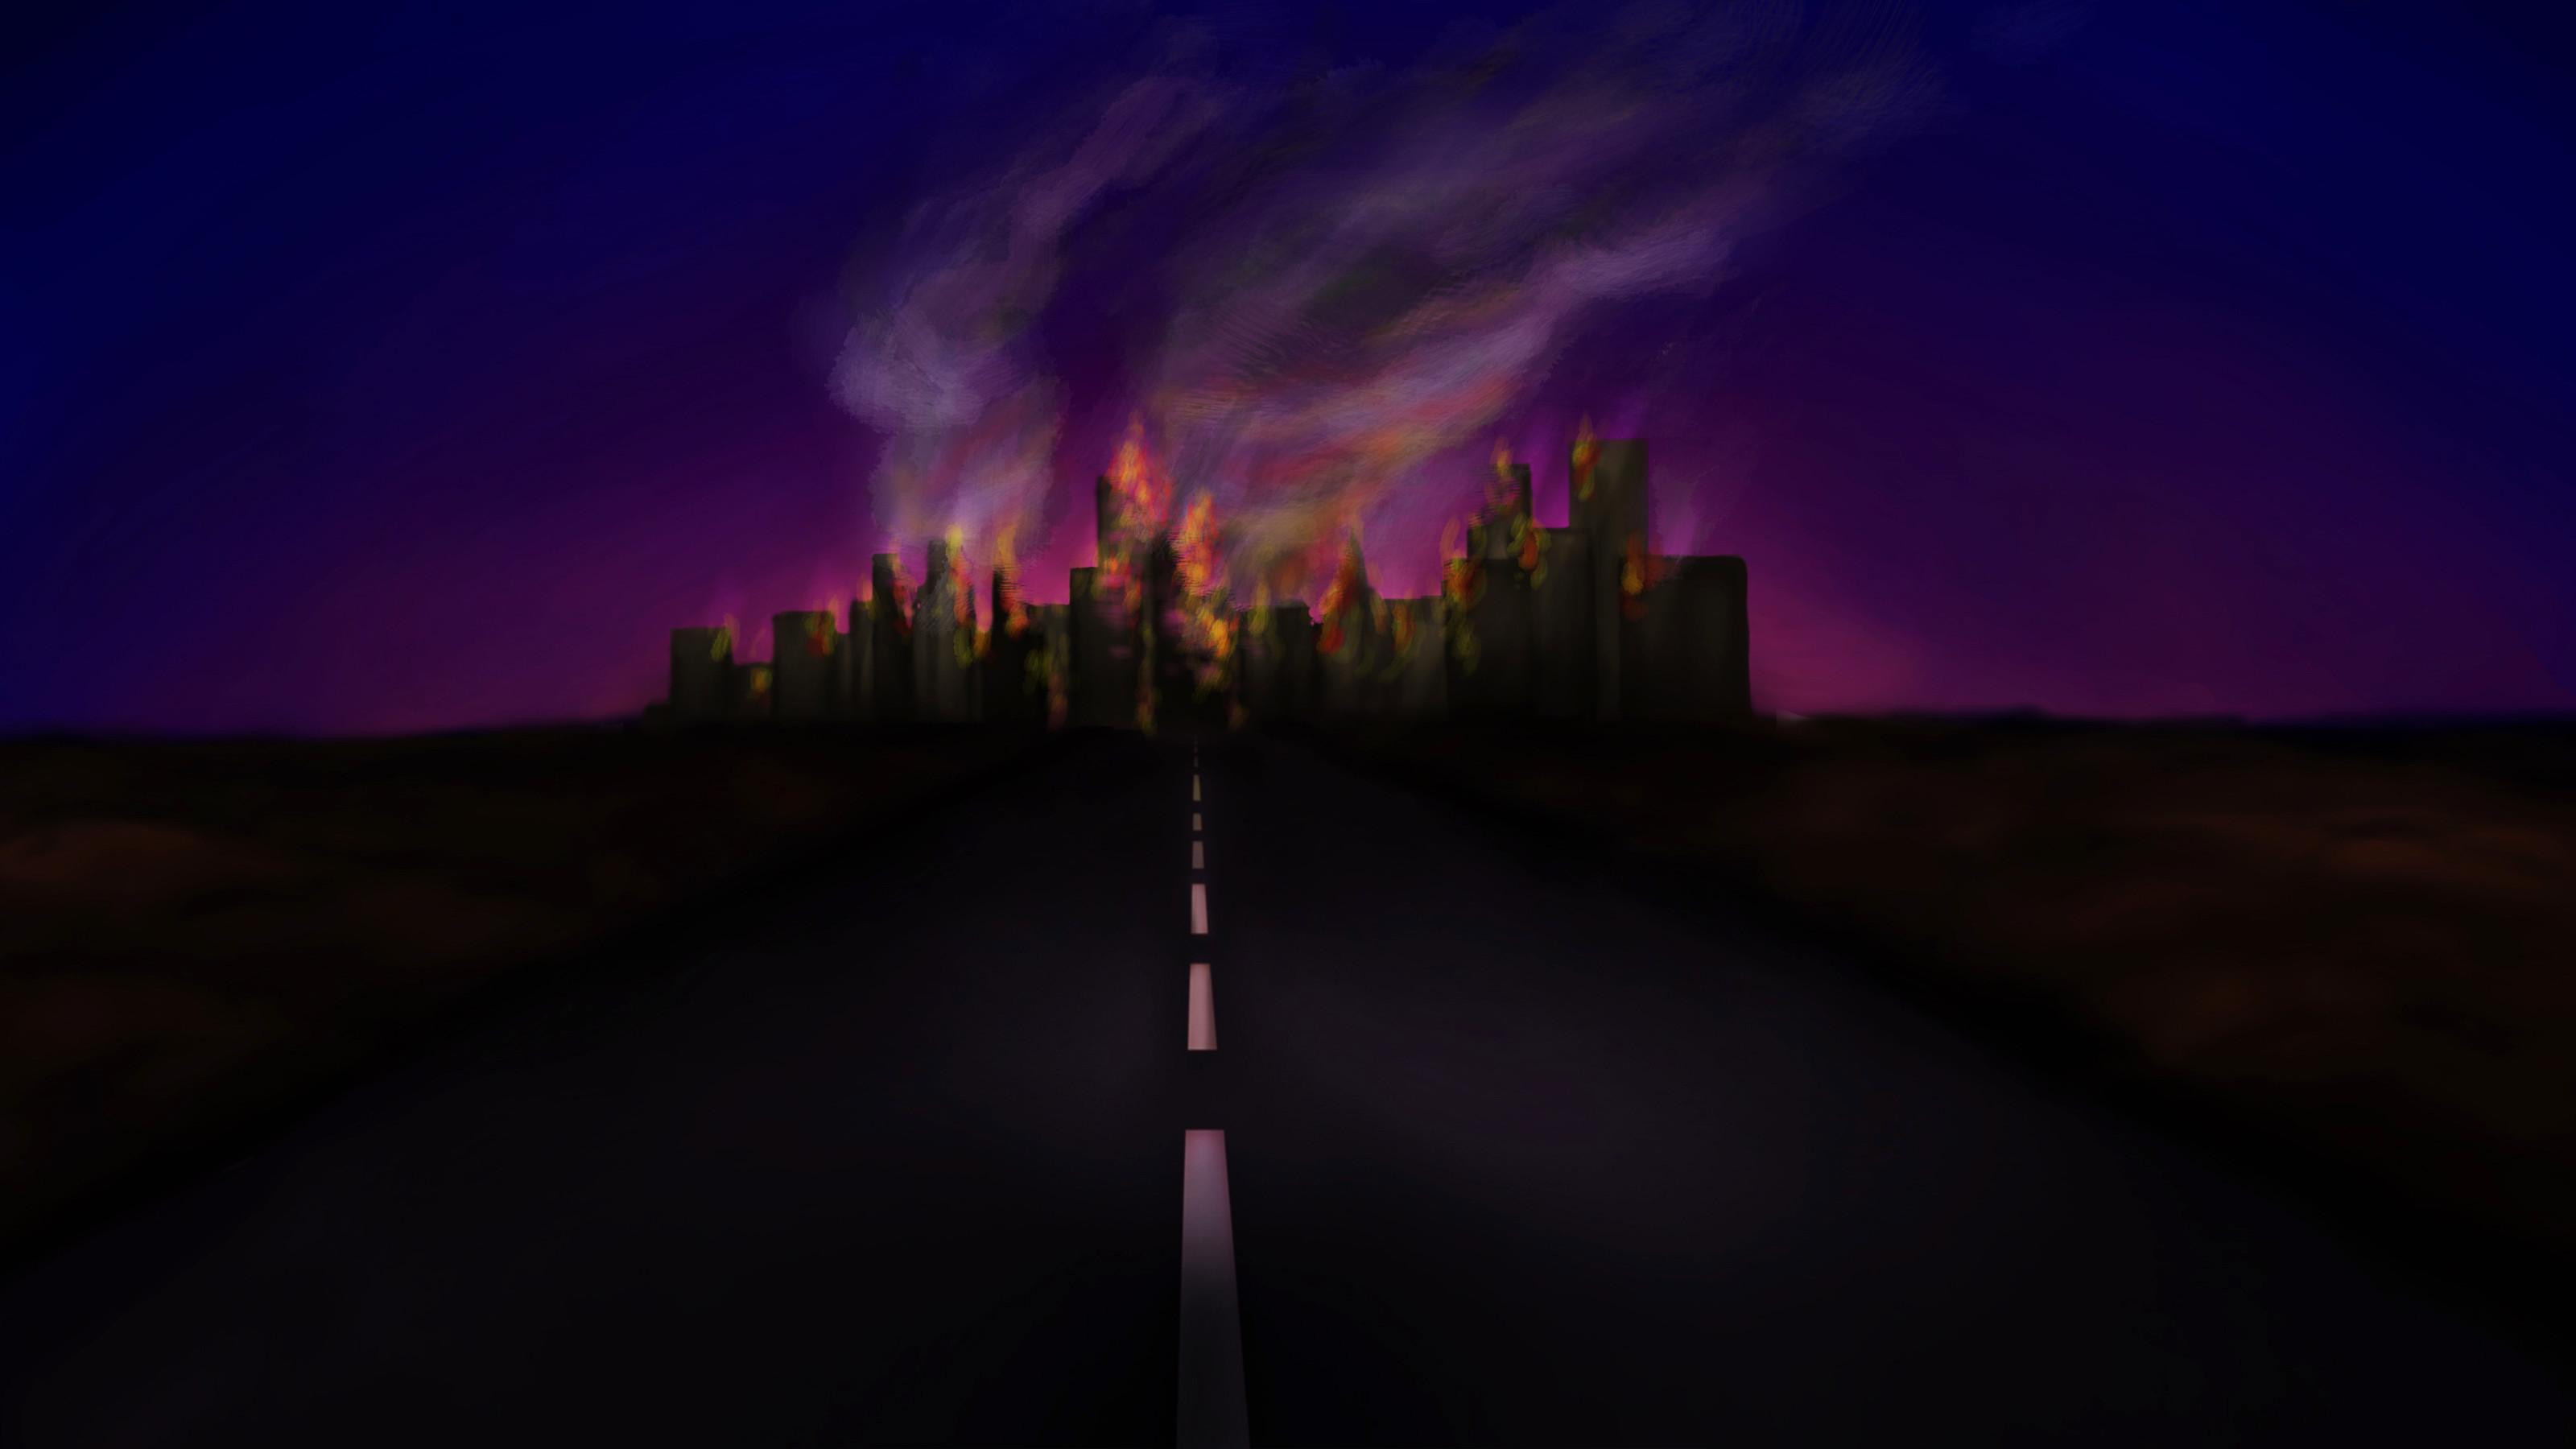 background city destroyed